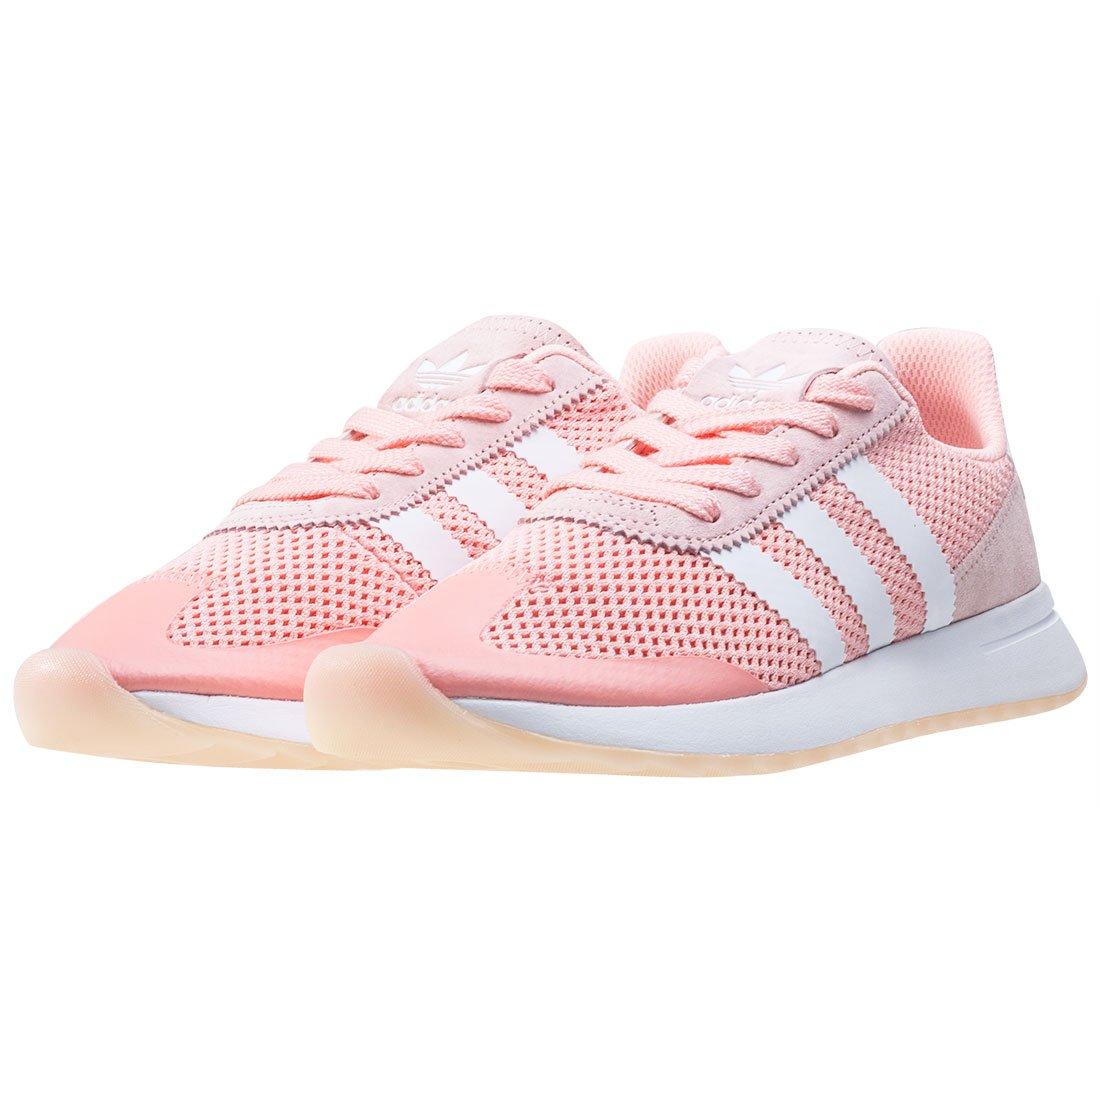 Adidas FLB_Runner W W W Haze Coral Weiß Haze Coral 92af2c